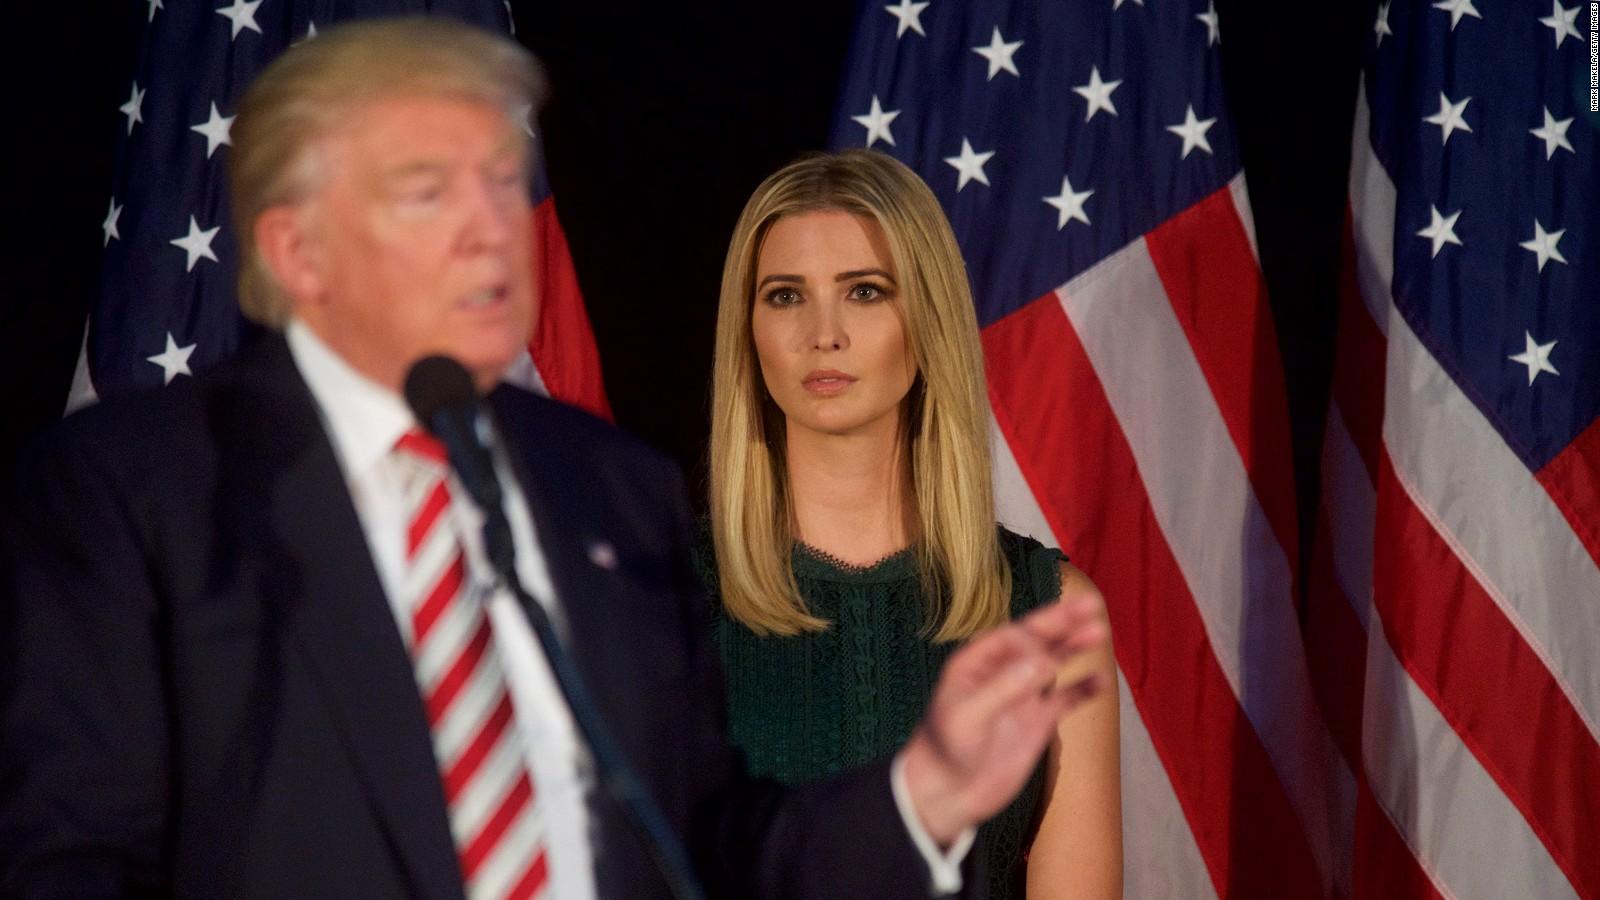 Exclusive FBI Counterintel Looks At Ivanka Trump Business Deal